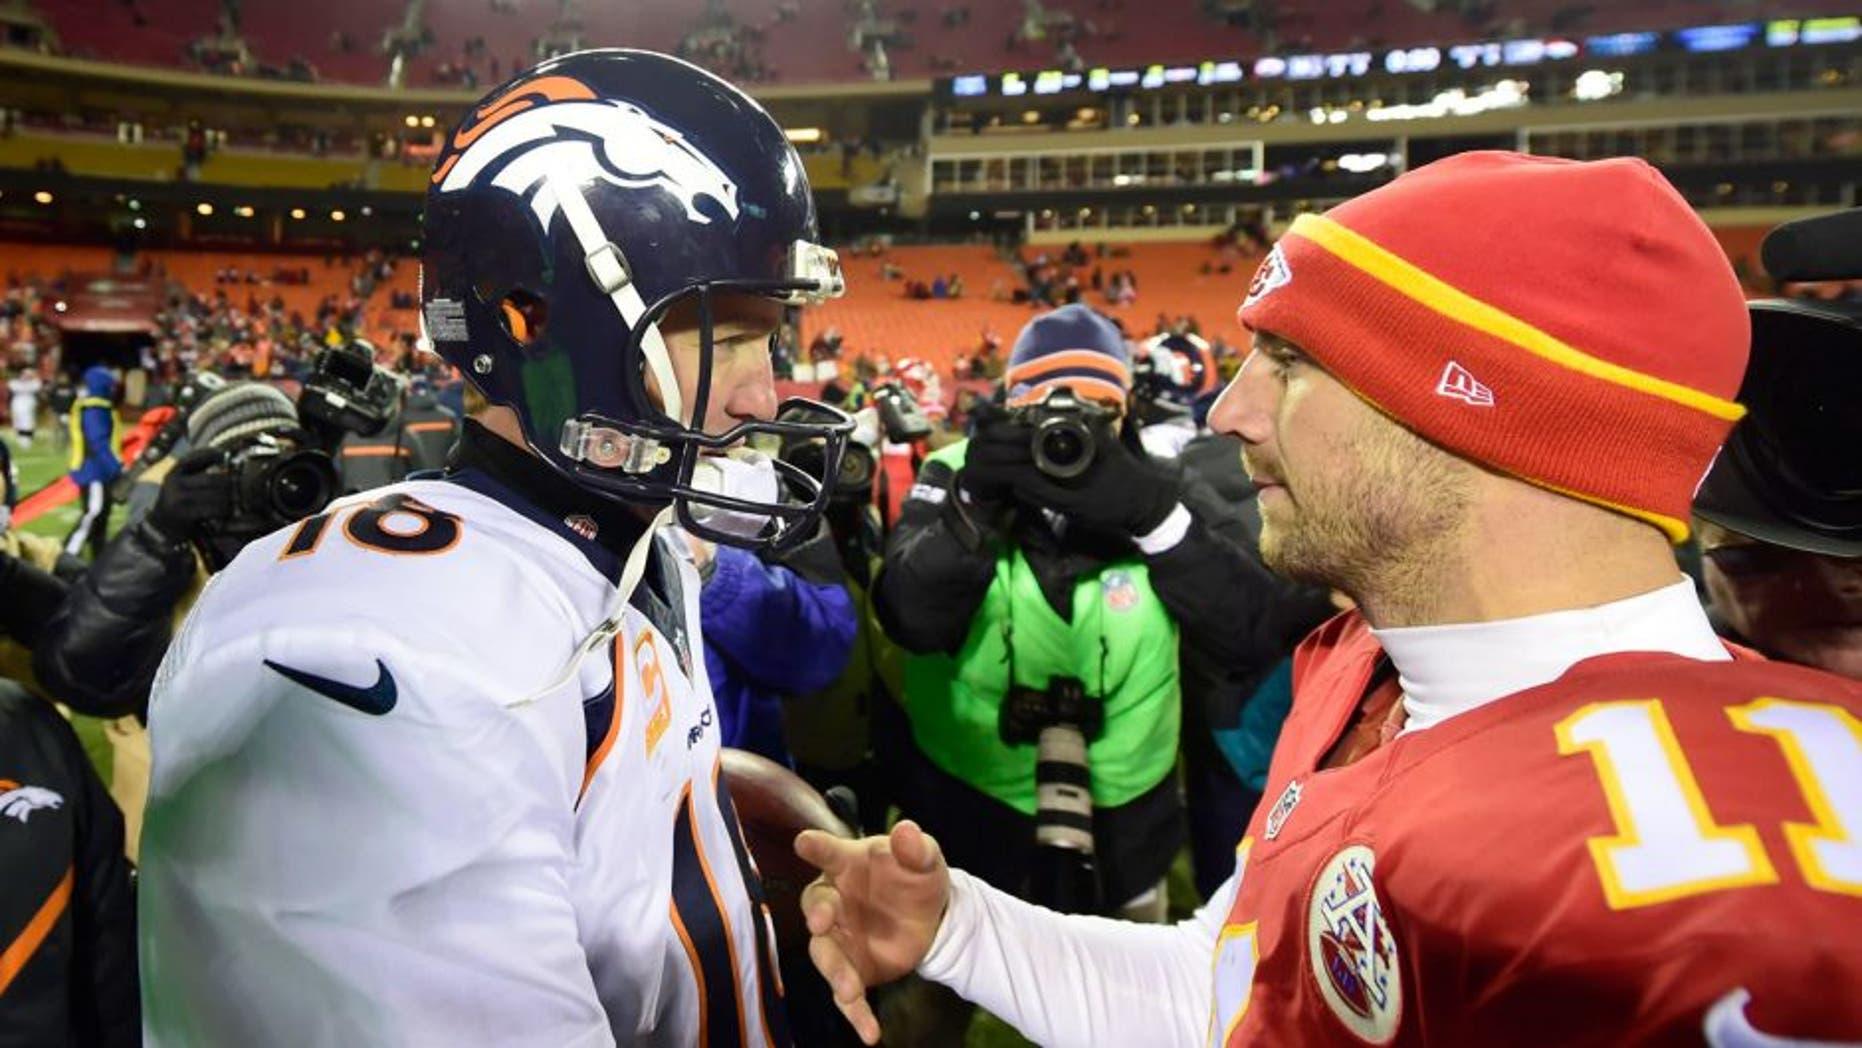 Nov 30, 2014; Kansas City, MO, USA; Denver Broncos quarterback Peyton Manning (18) greets Kansas City Chiefs quarterback Alex Smith (11) following the game at Arrowhead Stadium. The Broncos defeated the Chiefs 29-16. Mandatory Credit: Ron Chenoy-USA TODAY Sports